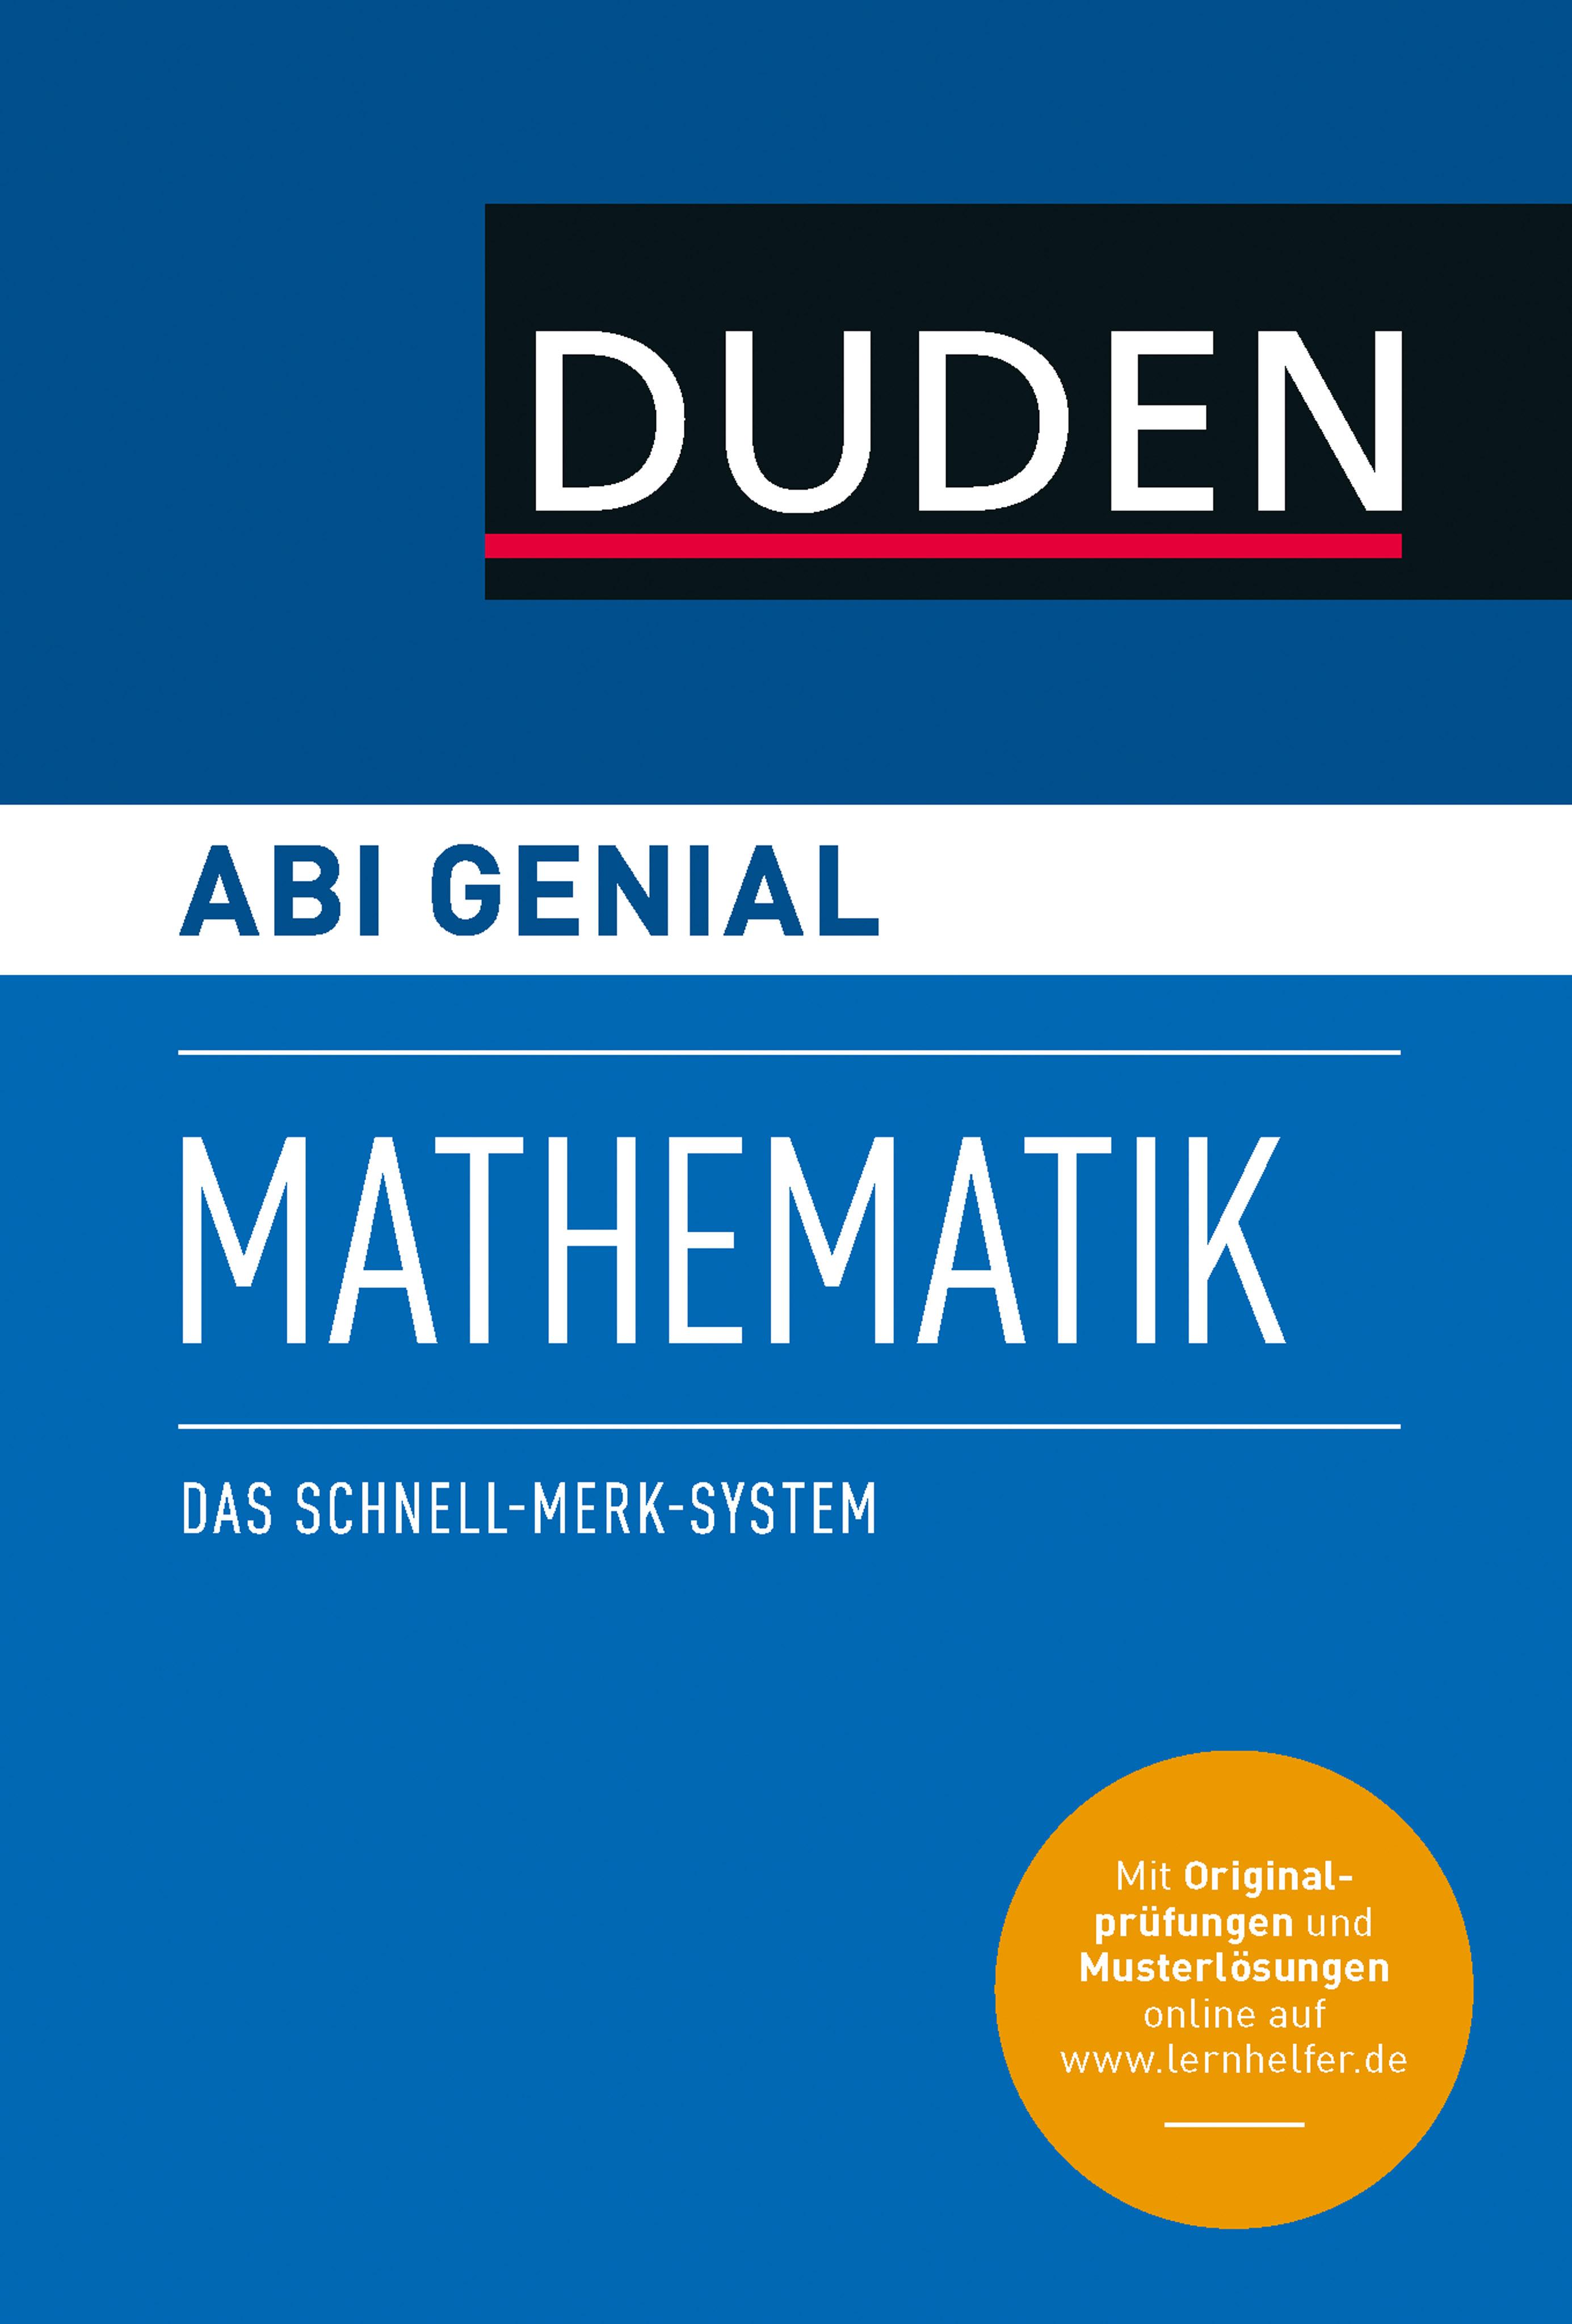 Karlheinz Weber Abi genial Mathematik